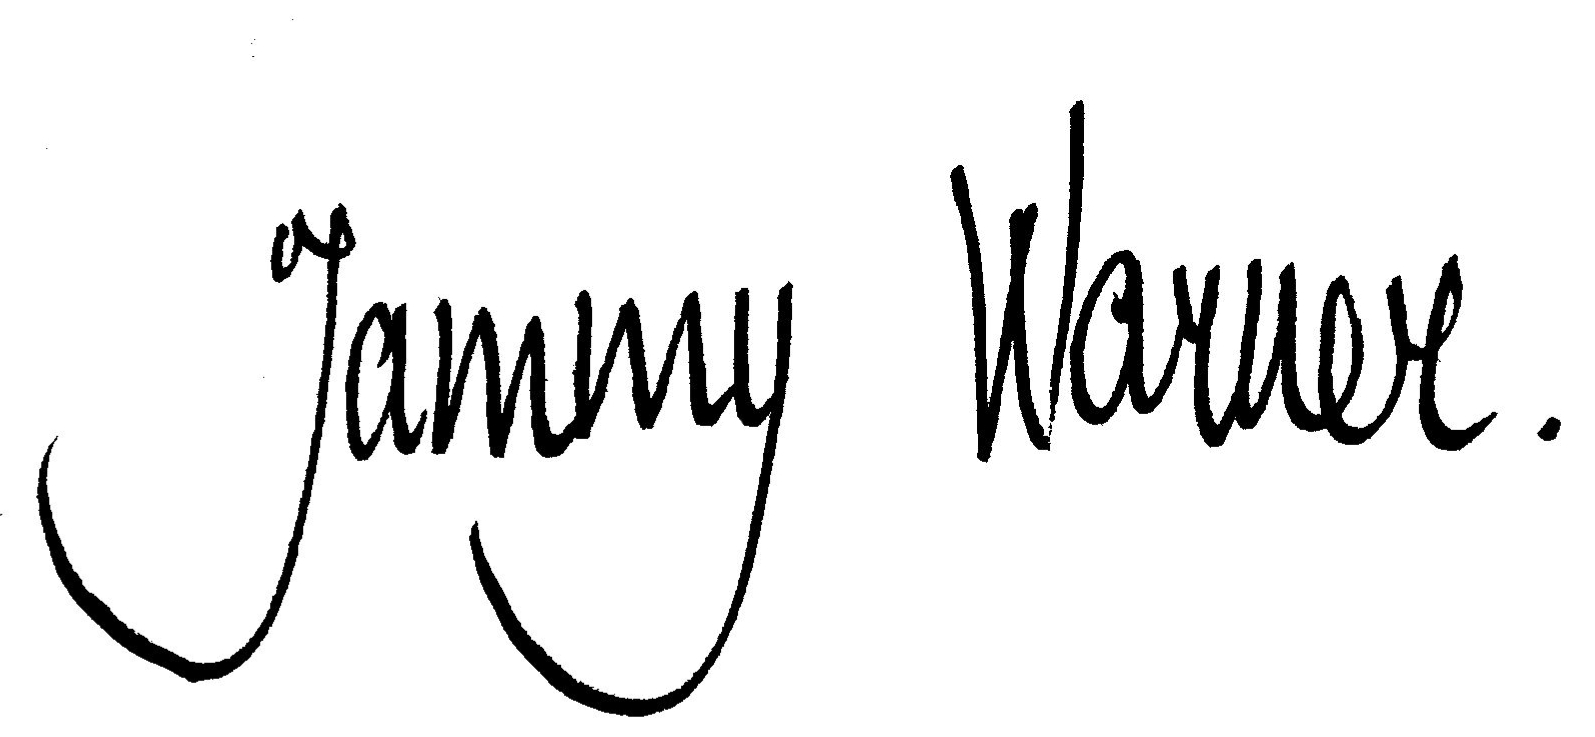 Tammy Warner's Signature